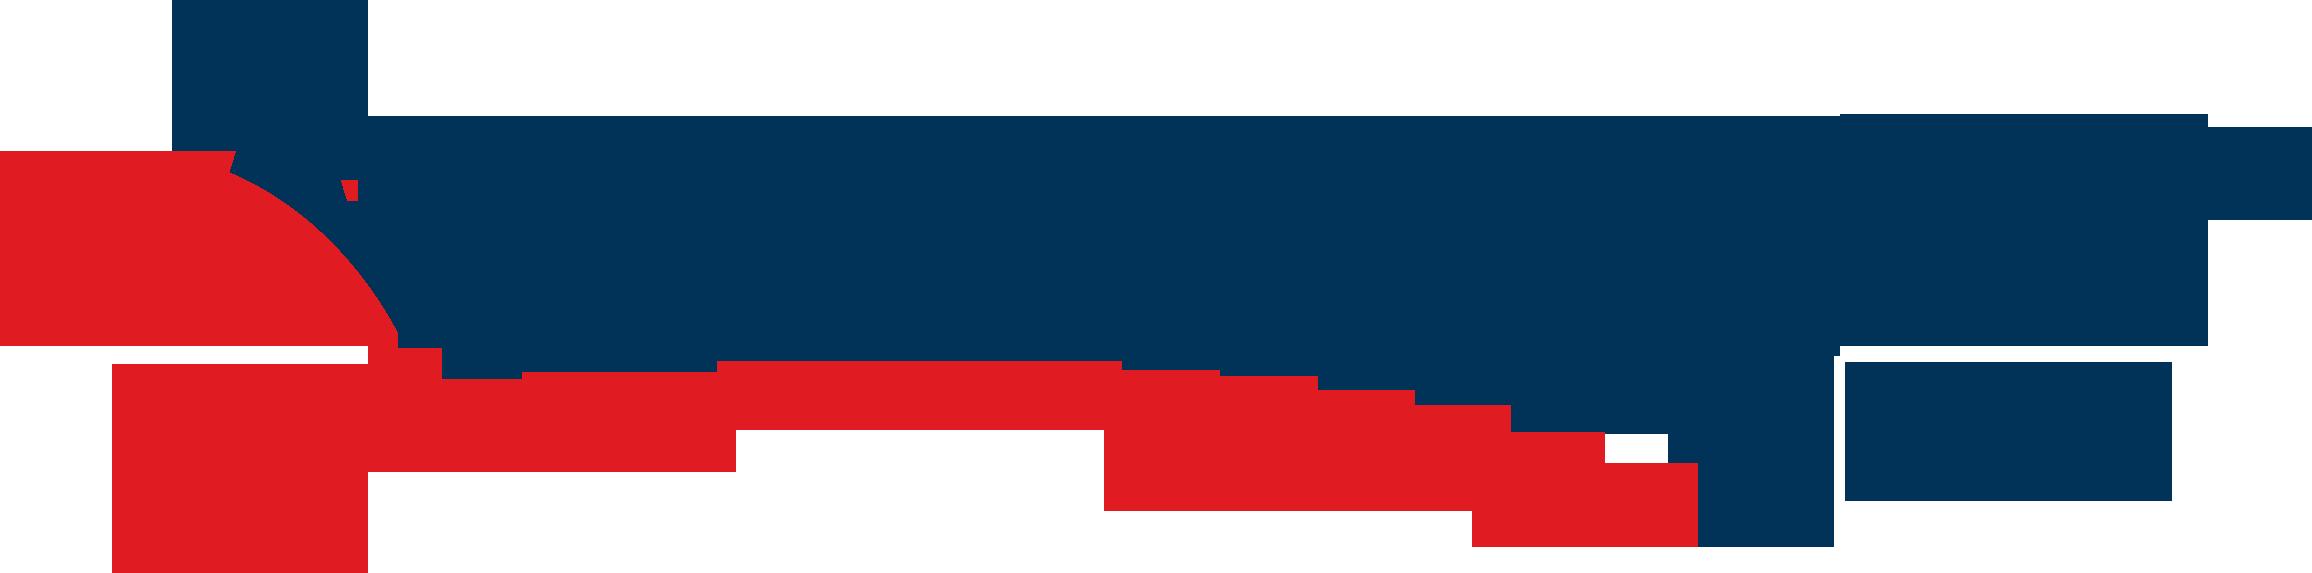 TSTC_Logo_2color_7.png